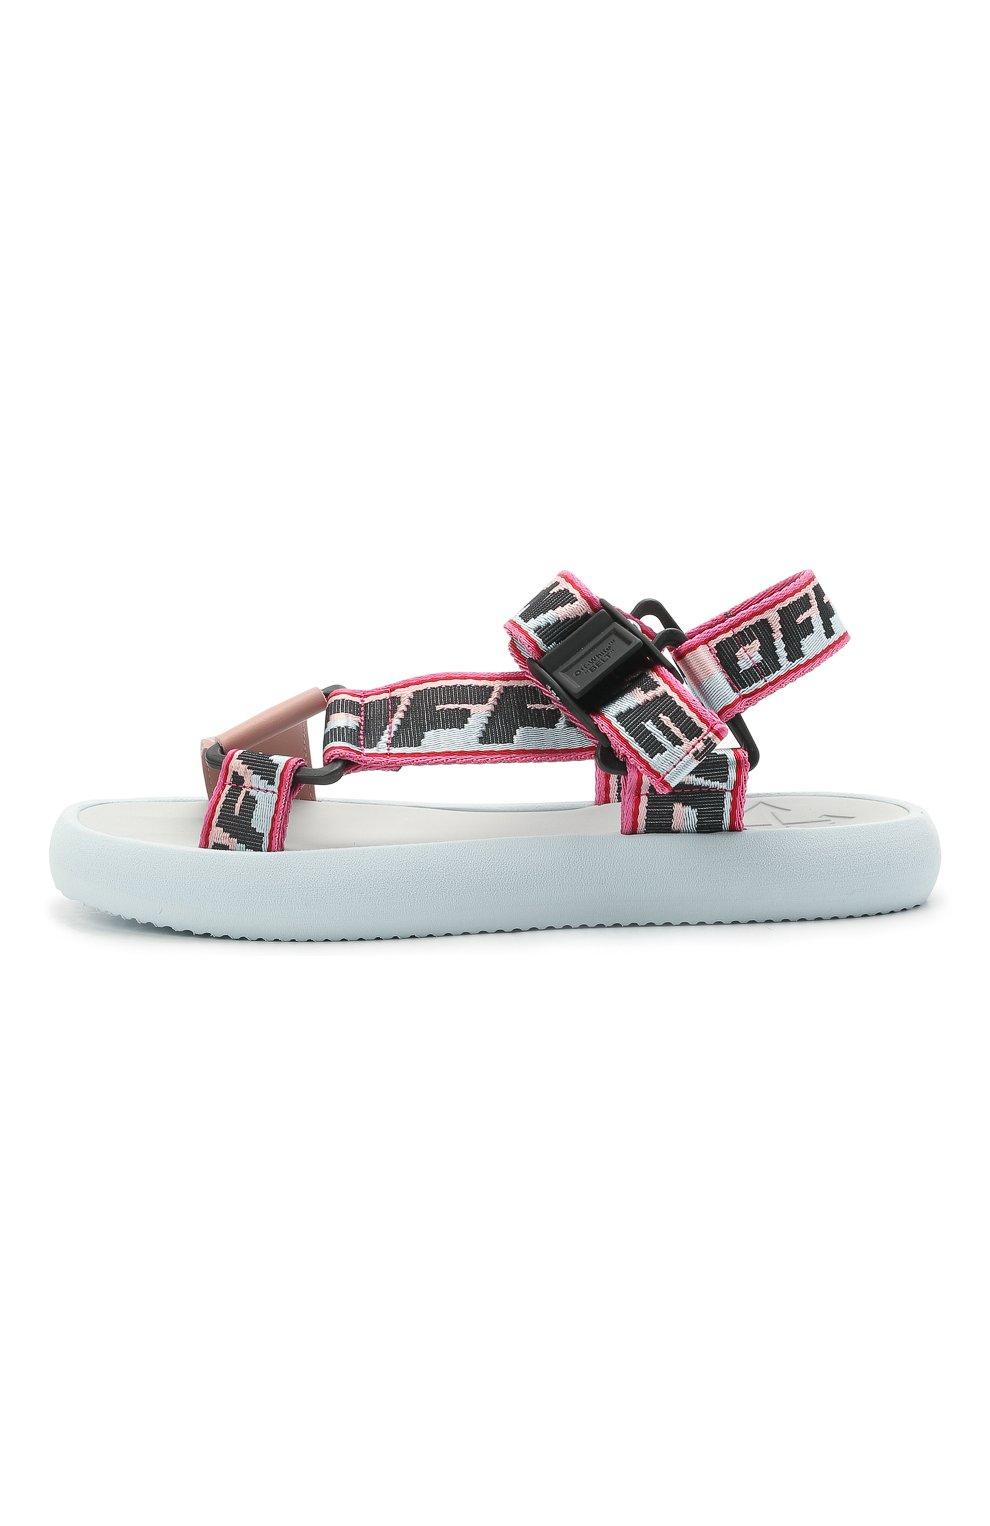 Женские текстильные сандалии OFF-WHITE розового цвета, арт. 0WIH007S21FAB0014230 | Фото 3 (Материал внешний: Текстиль; Подошва: Платформа)